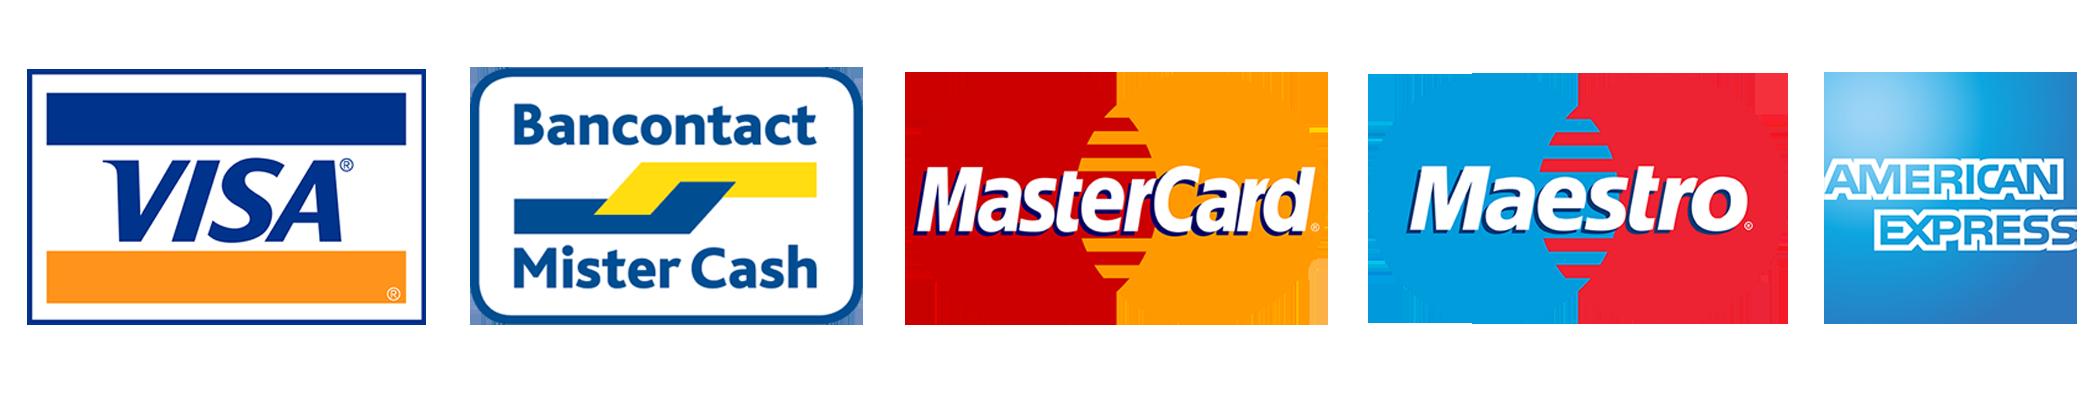 Mode paiement VISA Bancontact Mobile